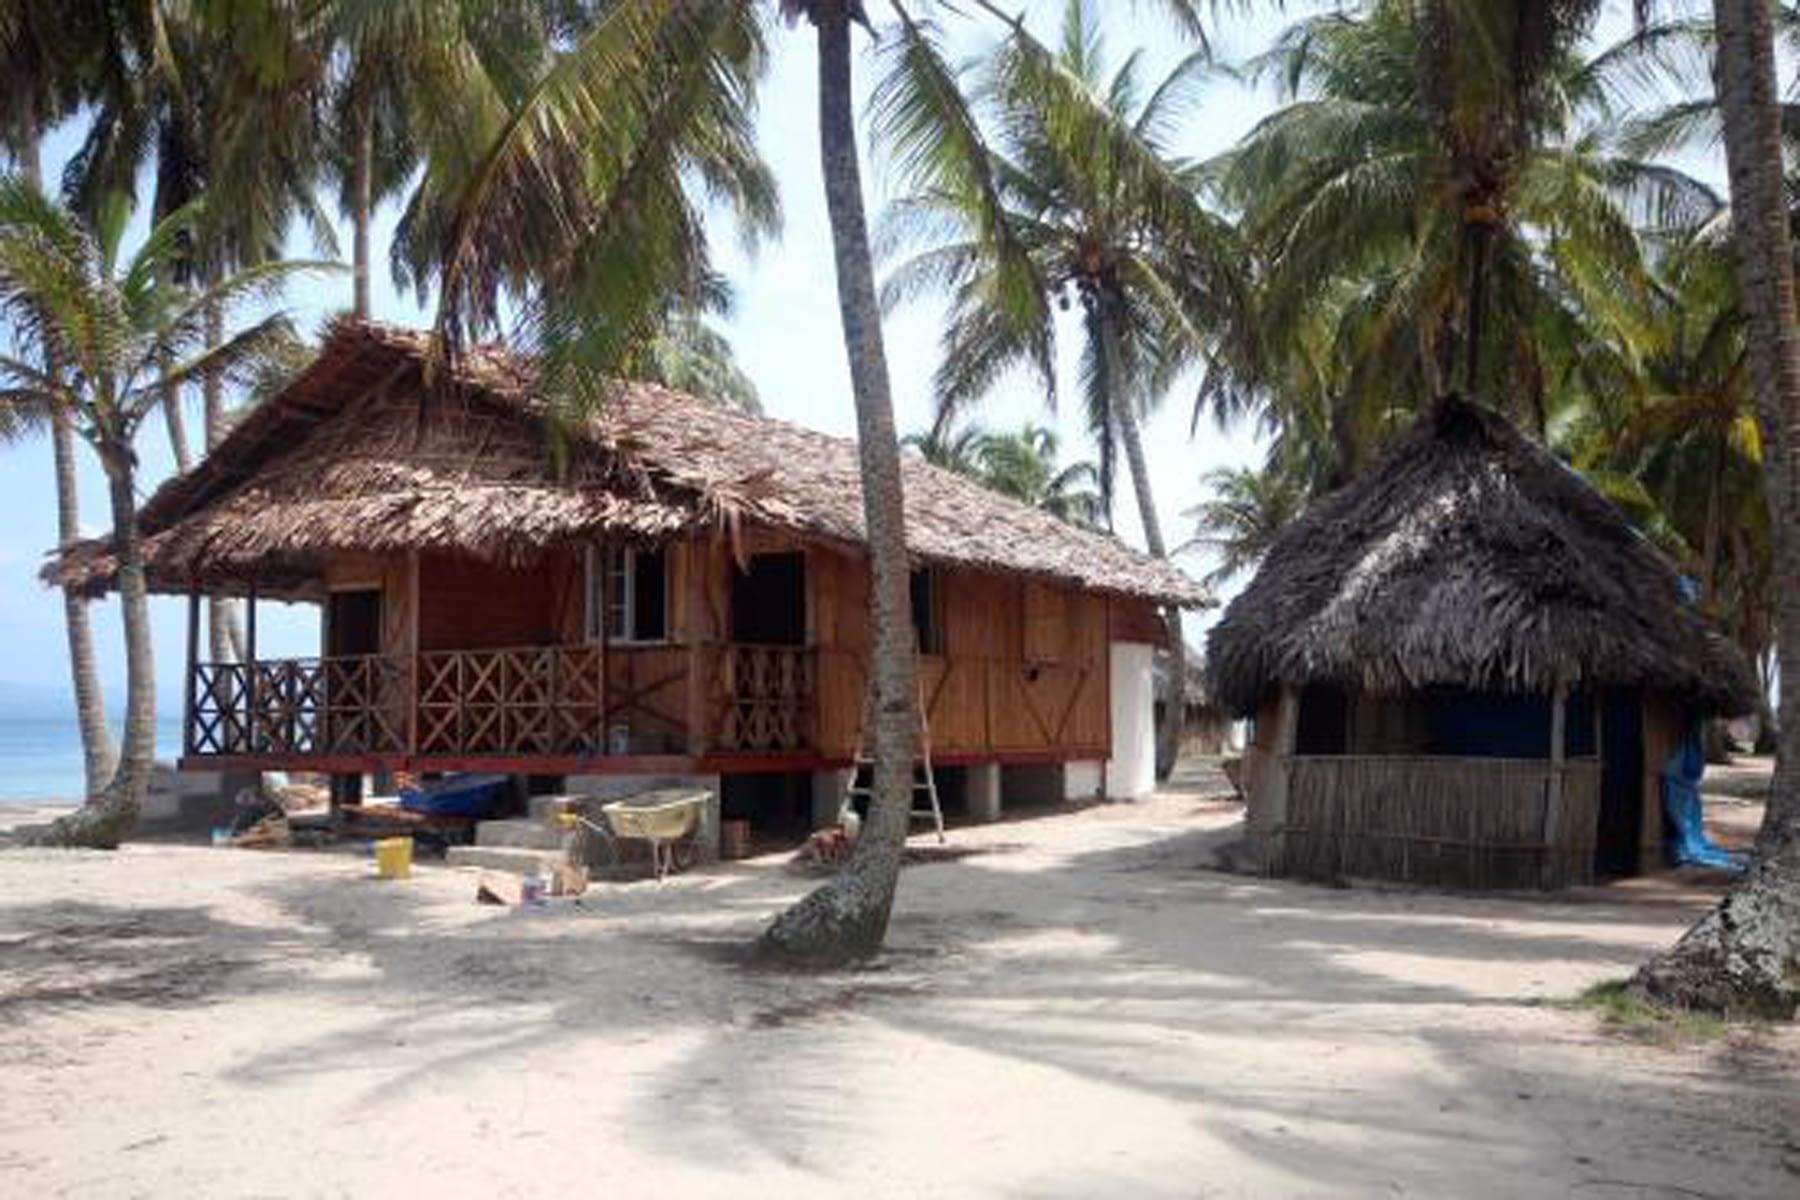 Cabañas en Isla Iggodub